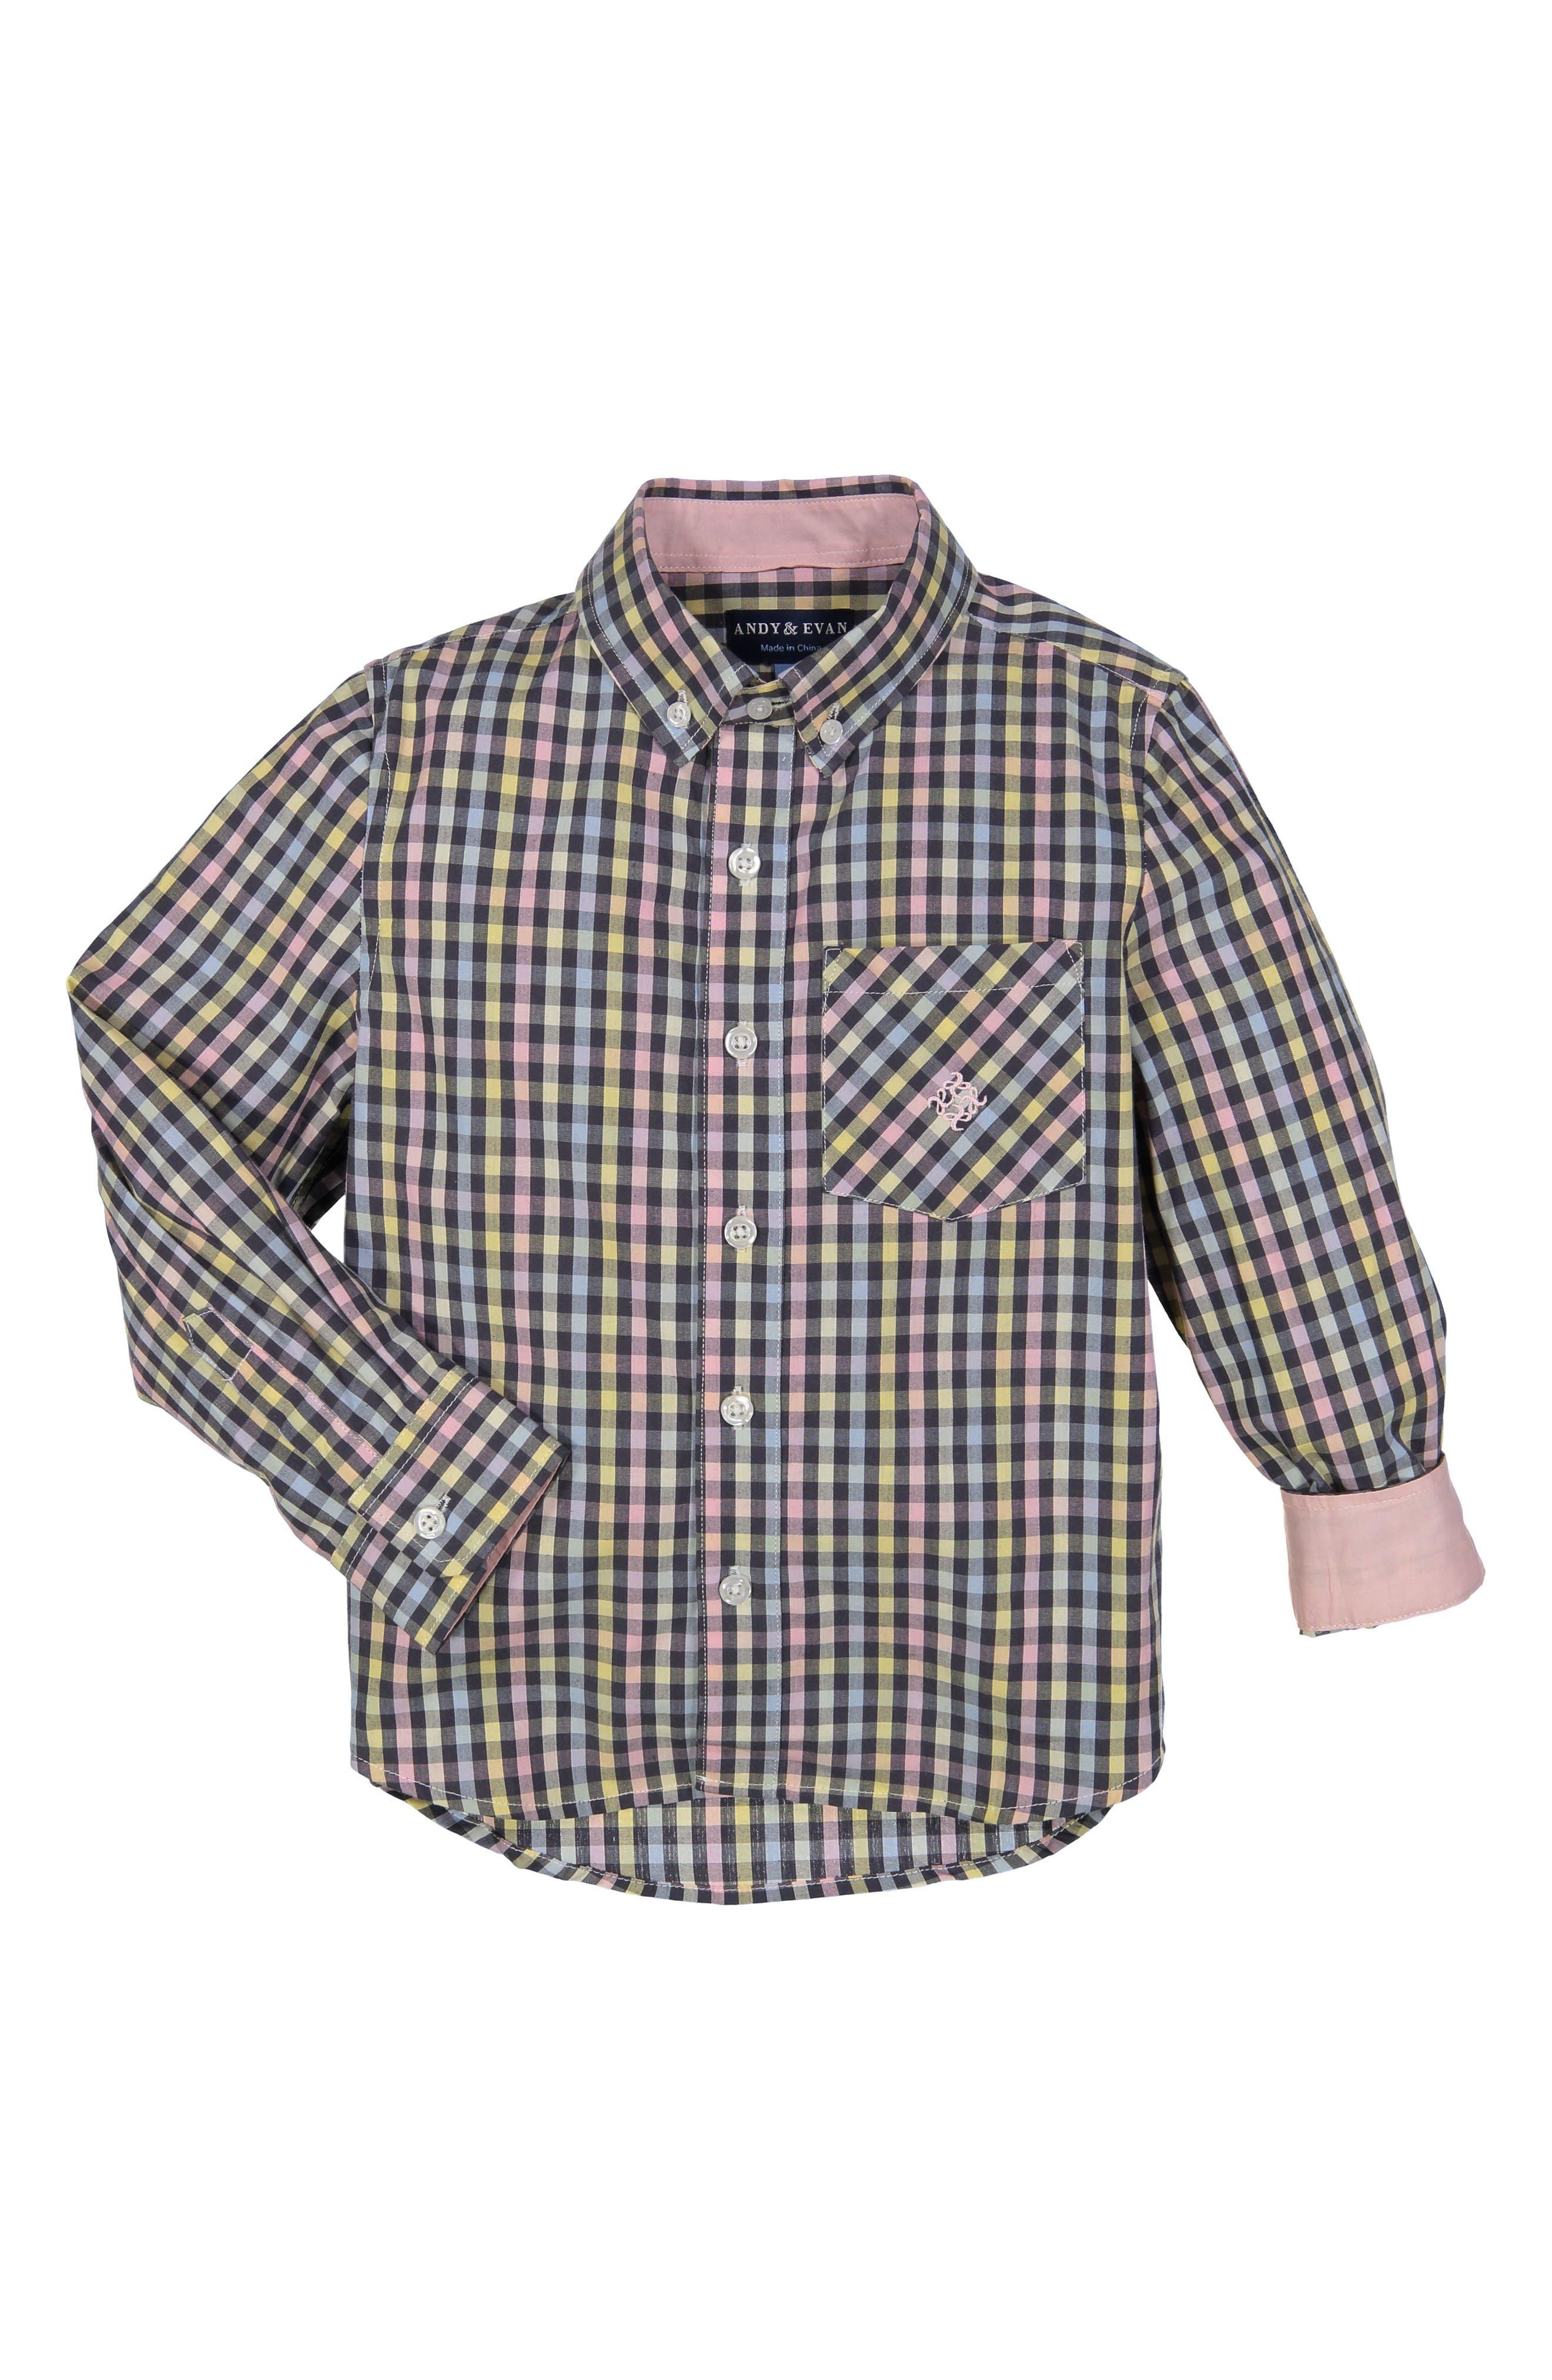 Gingham Check Woven Shirt,                             Main thumbnail 1, color,                             Light/ Pastel Pink